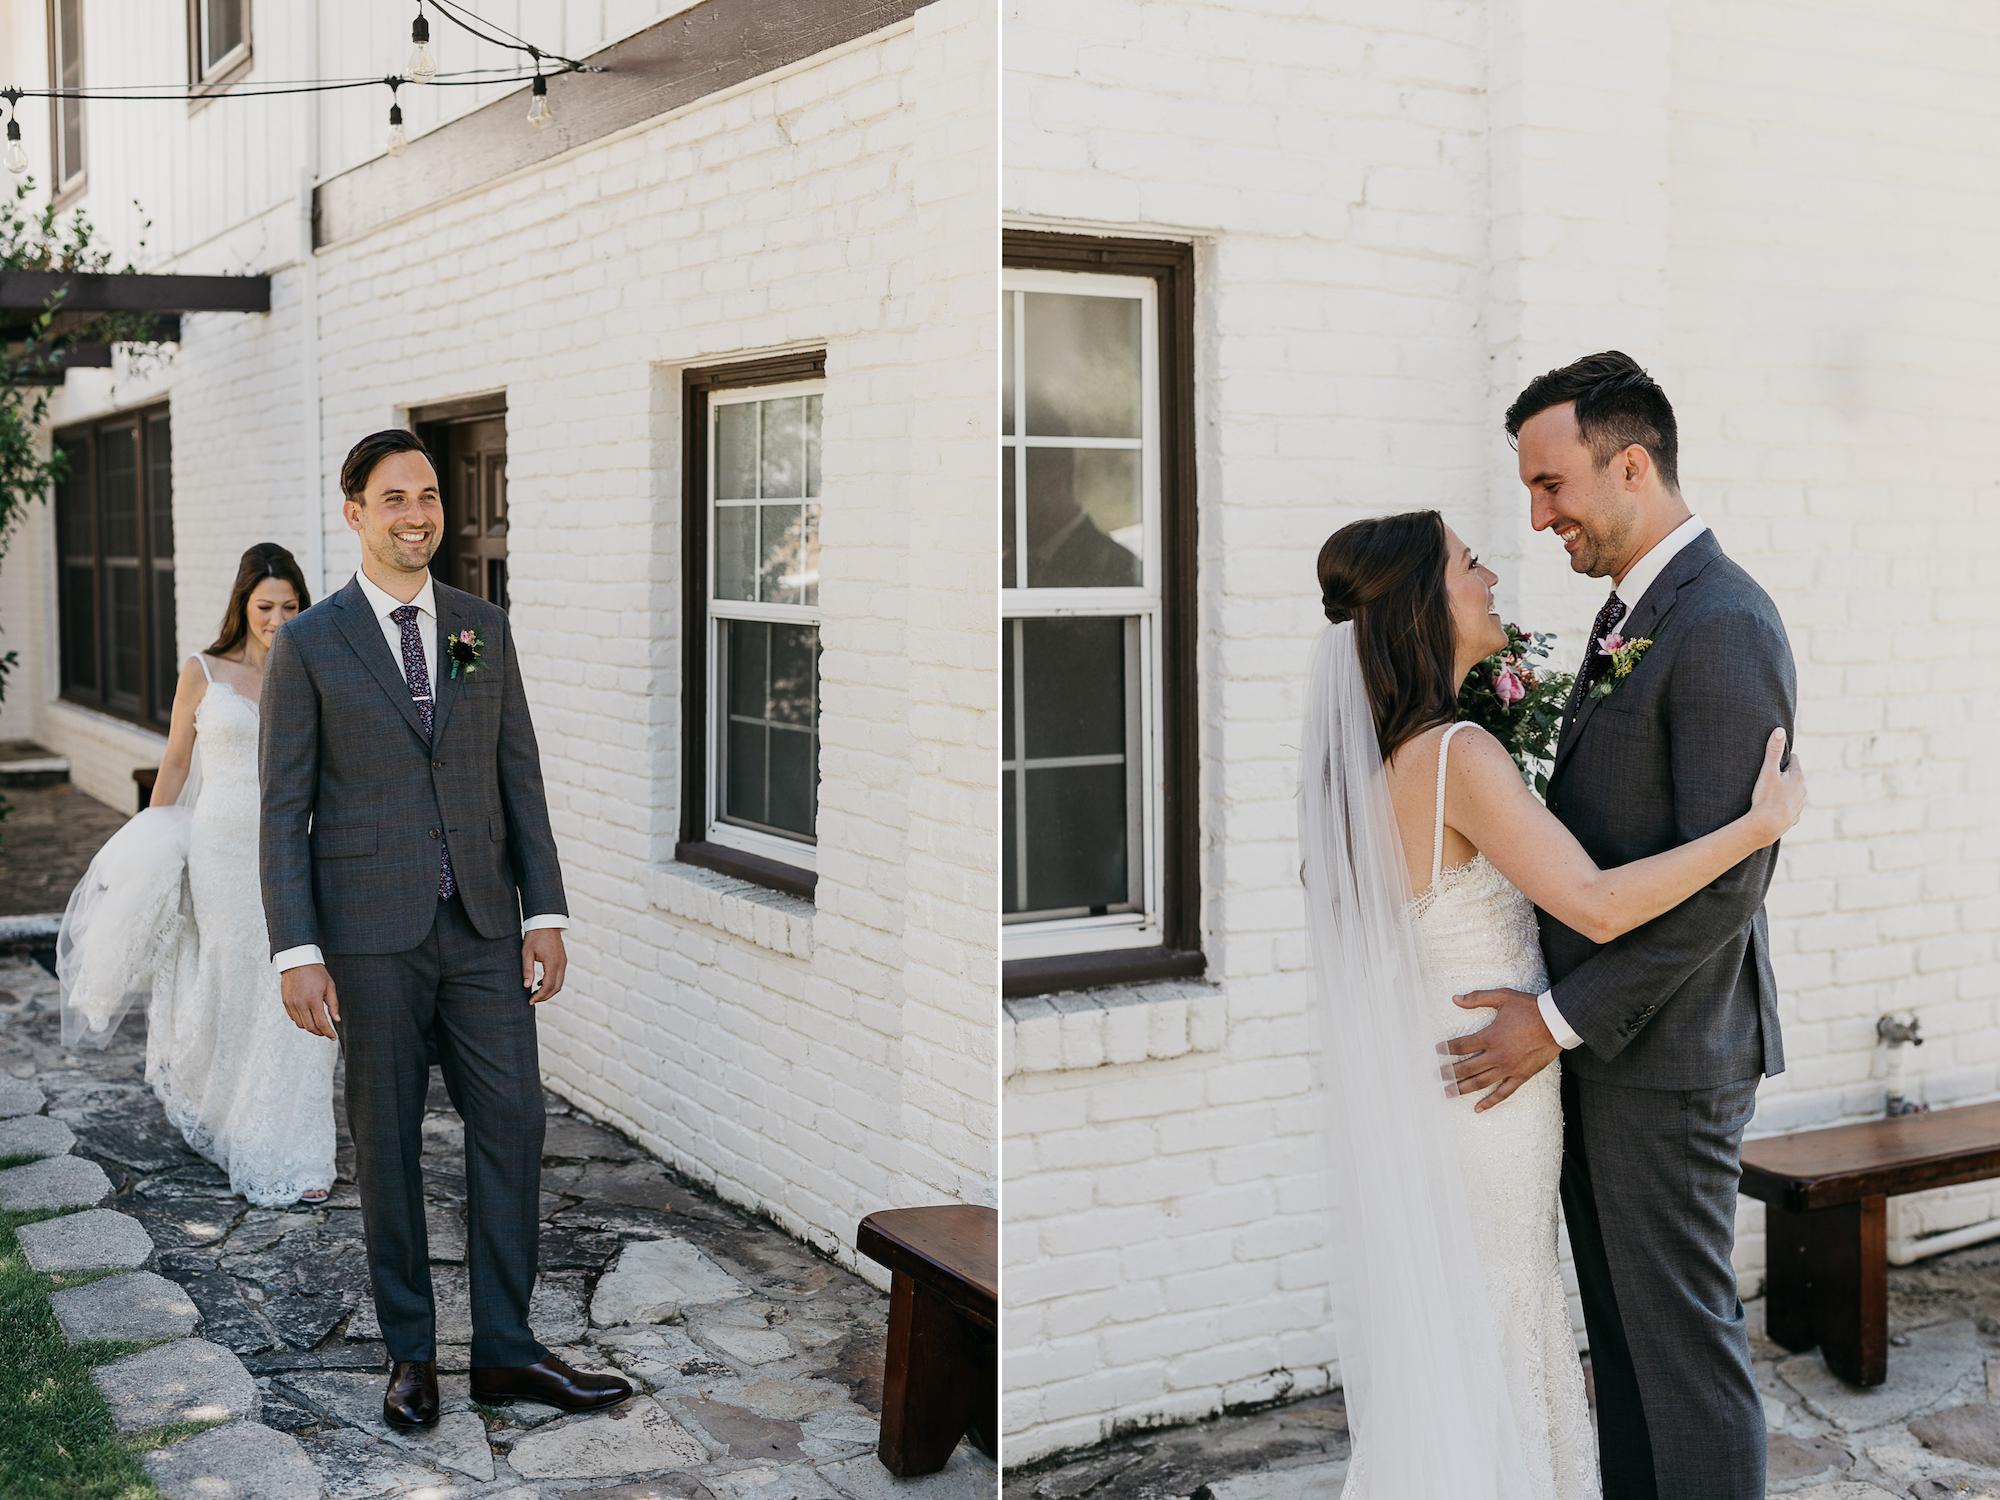 destination - wedding - photography 007.jpg